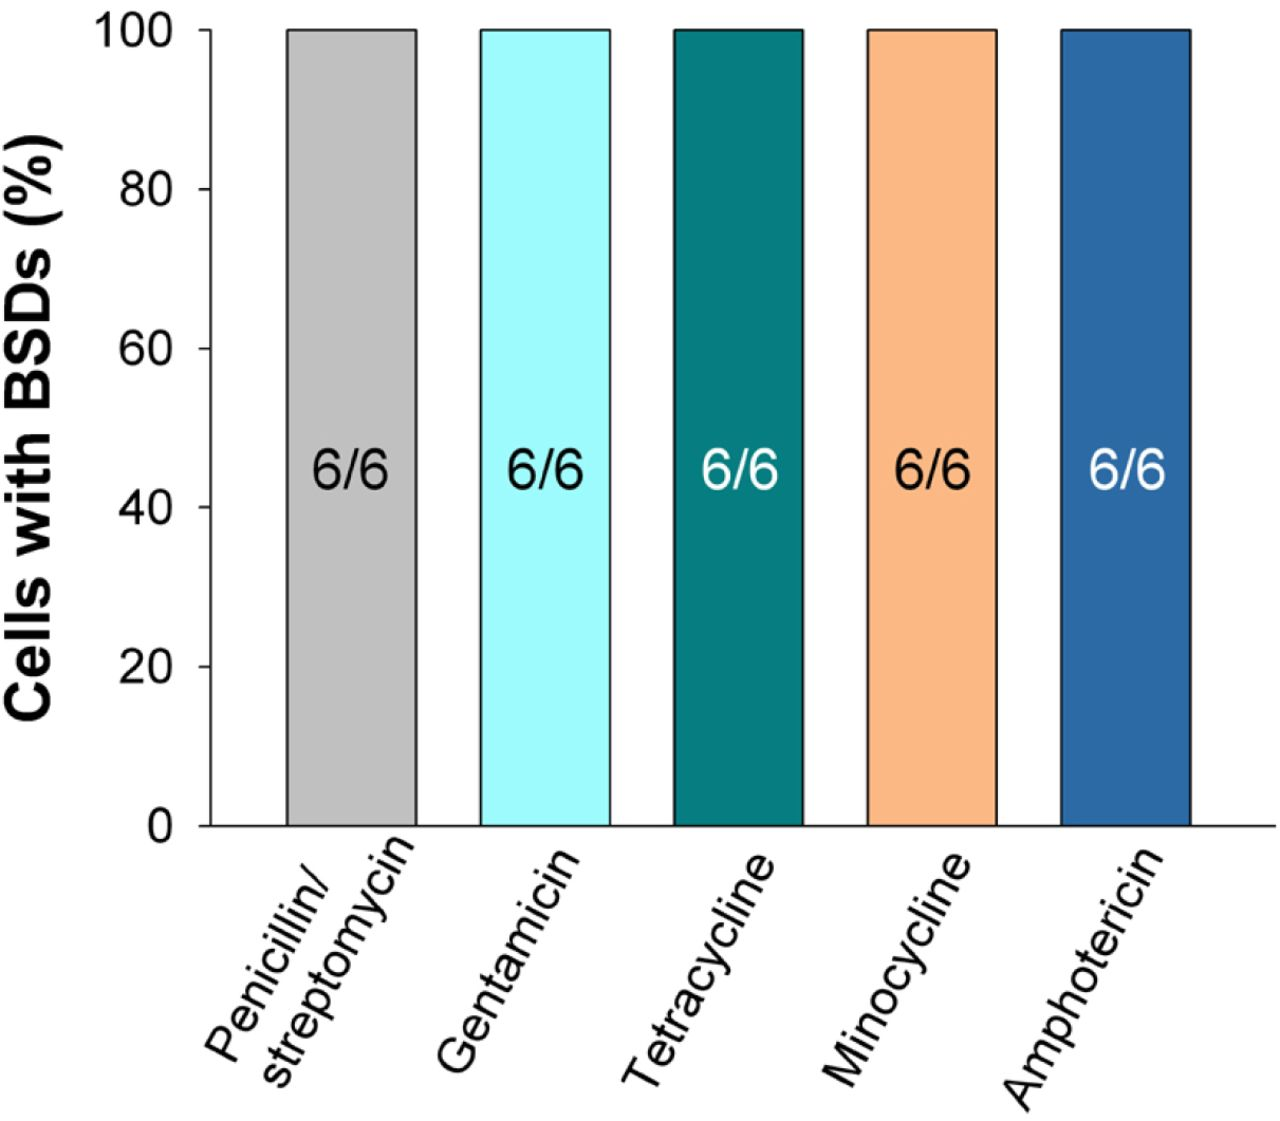 prednisolone acetate ophthalmic suspension usp price